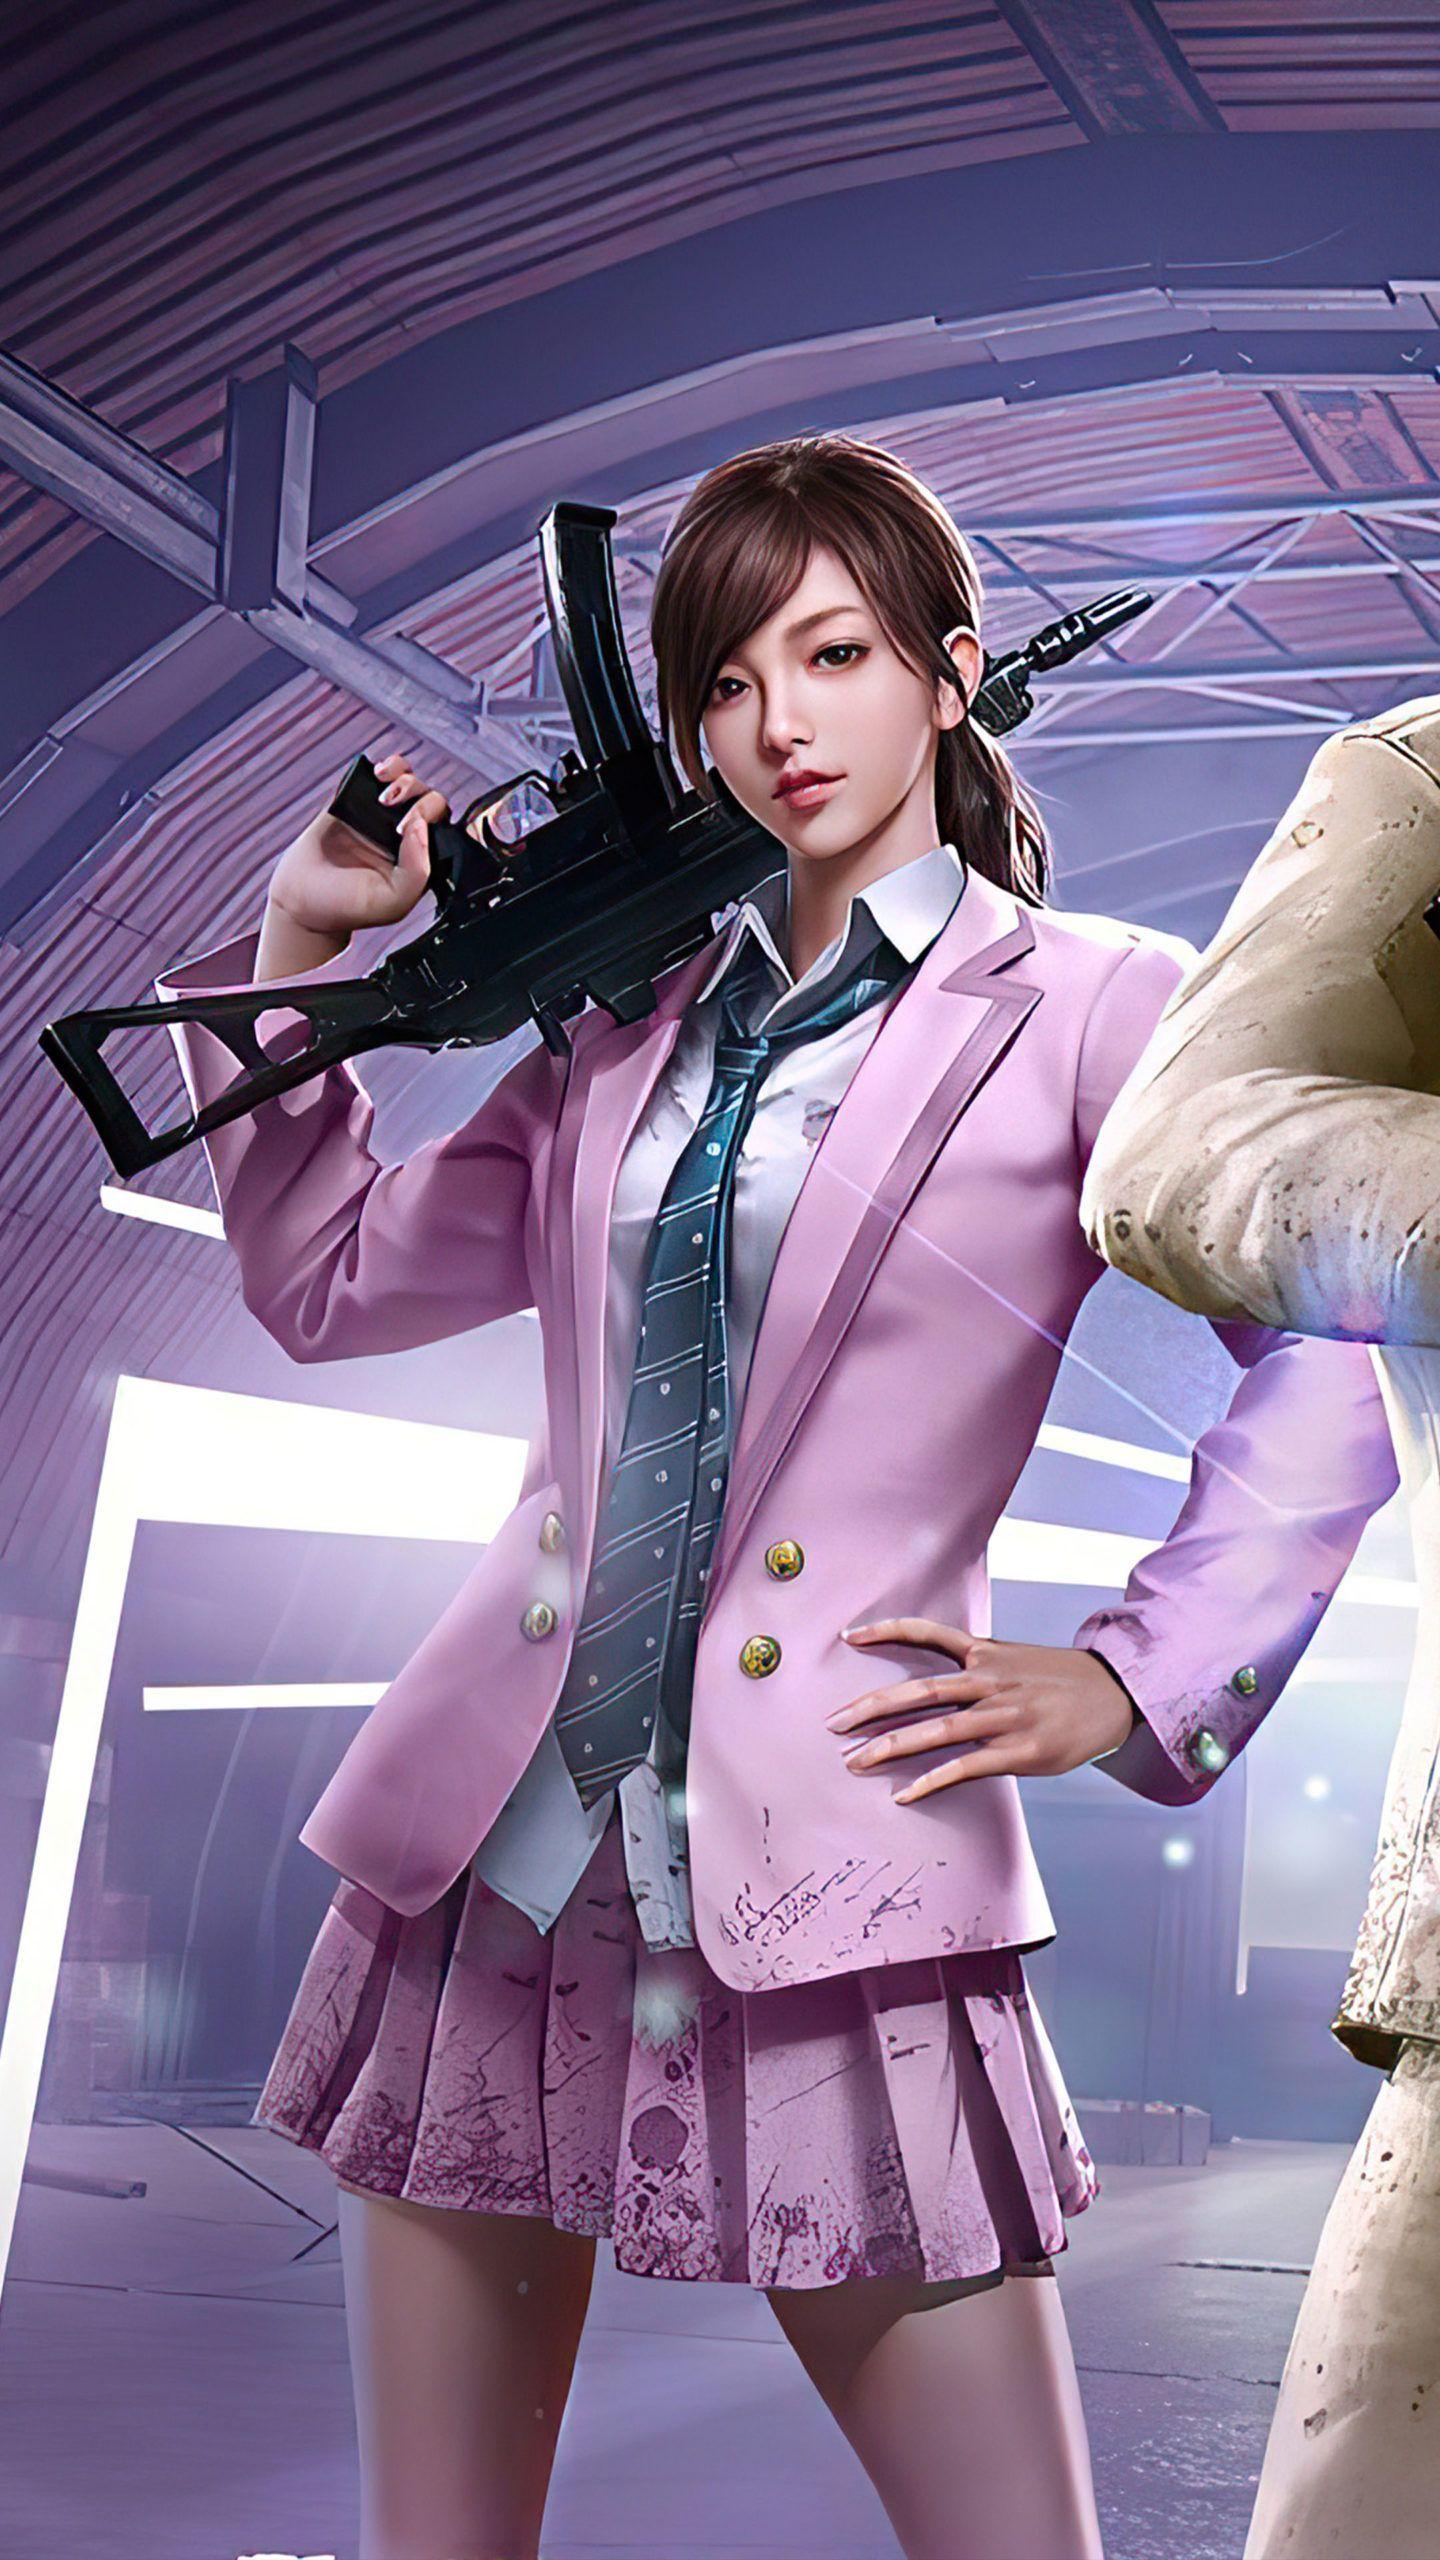 PUBG Girl Agent 4K Ultra HD Mobile Wallpaper in 2020